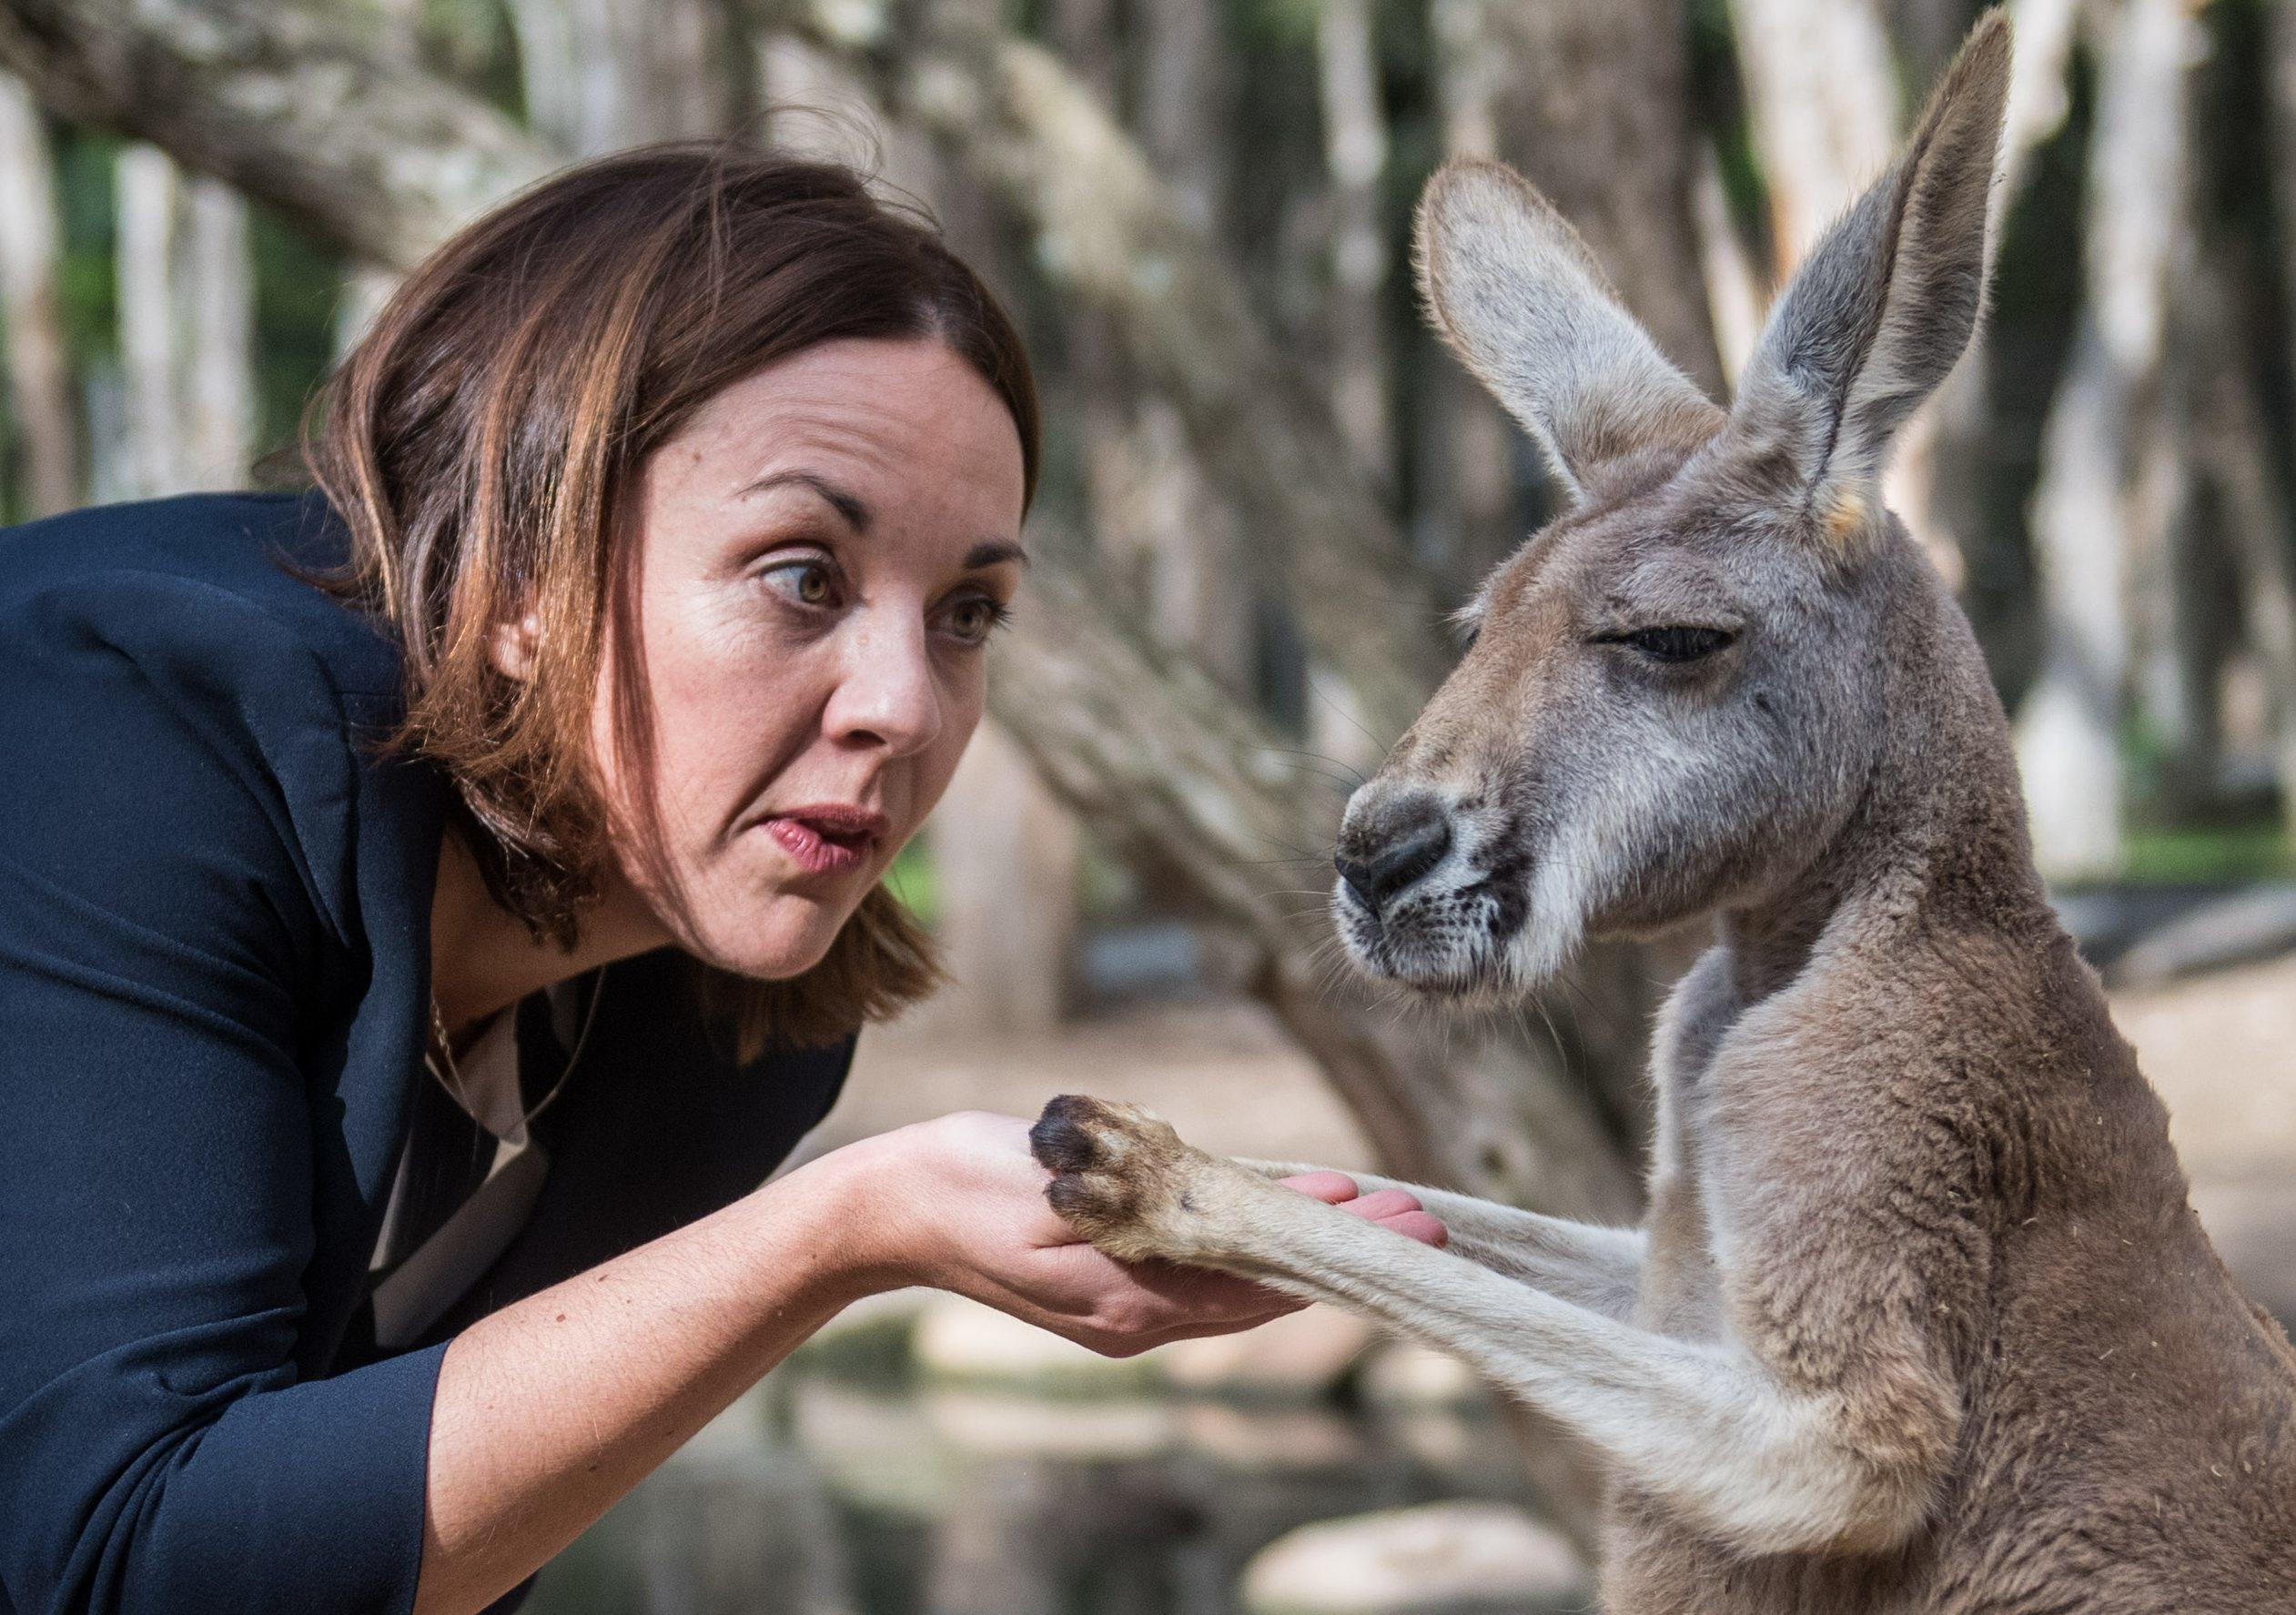 Kezia Dugdale feeding a Kangaroo (James Gourley/REX/Shutterstock)